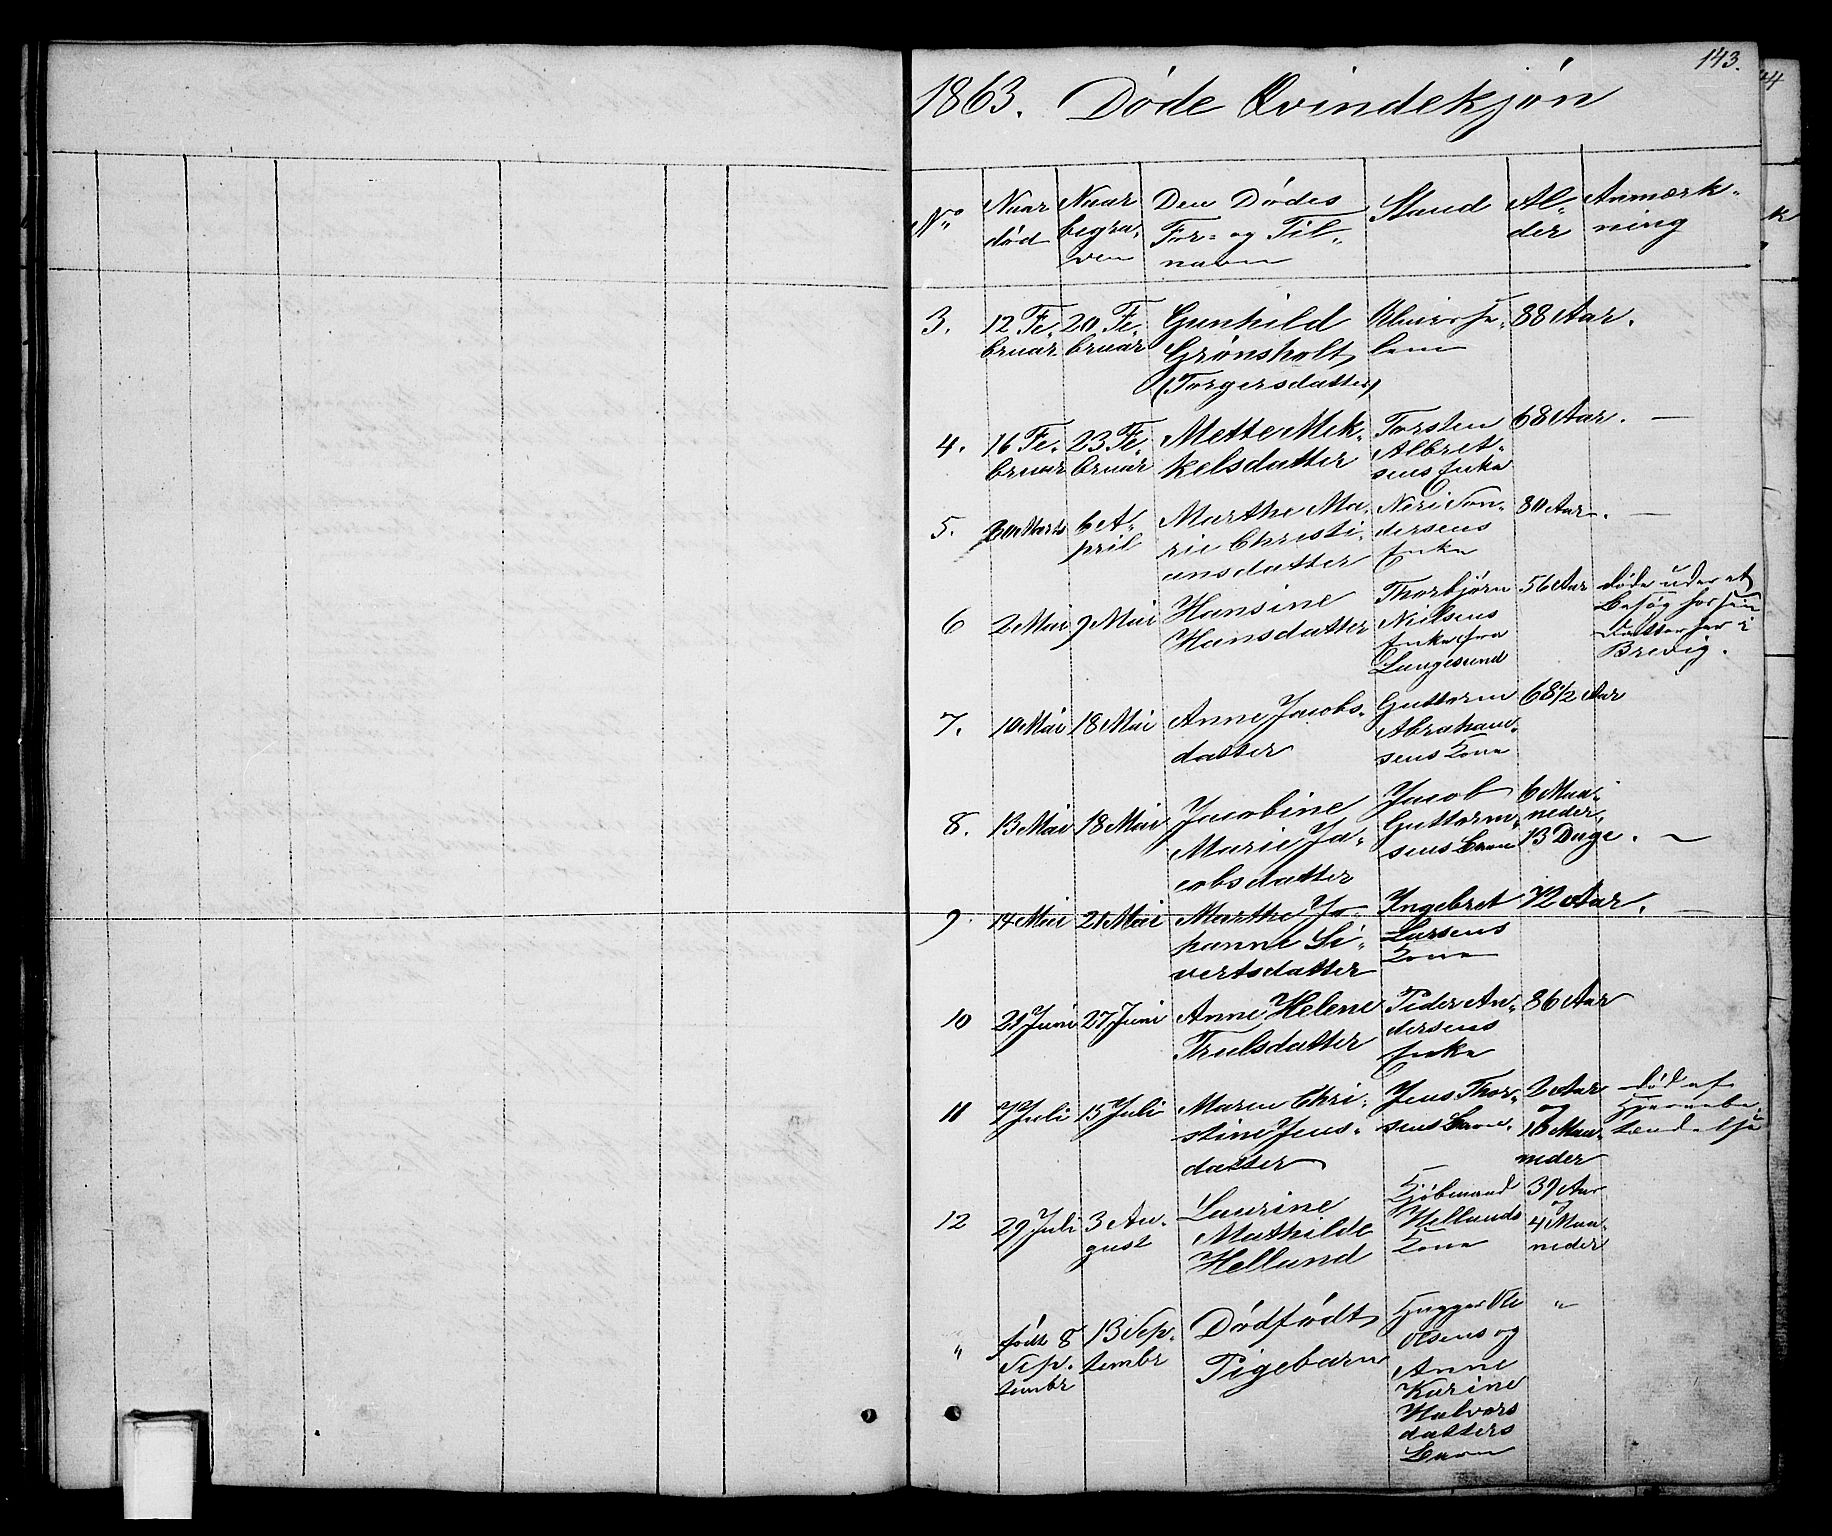 SAKO, Brevik kirkebøker, G/Ga/L0002: Klokkerbok nr. 2, 1846-1865, s. 143